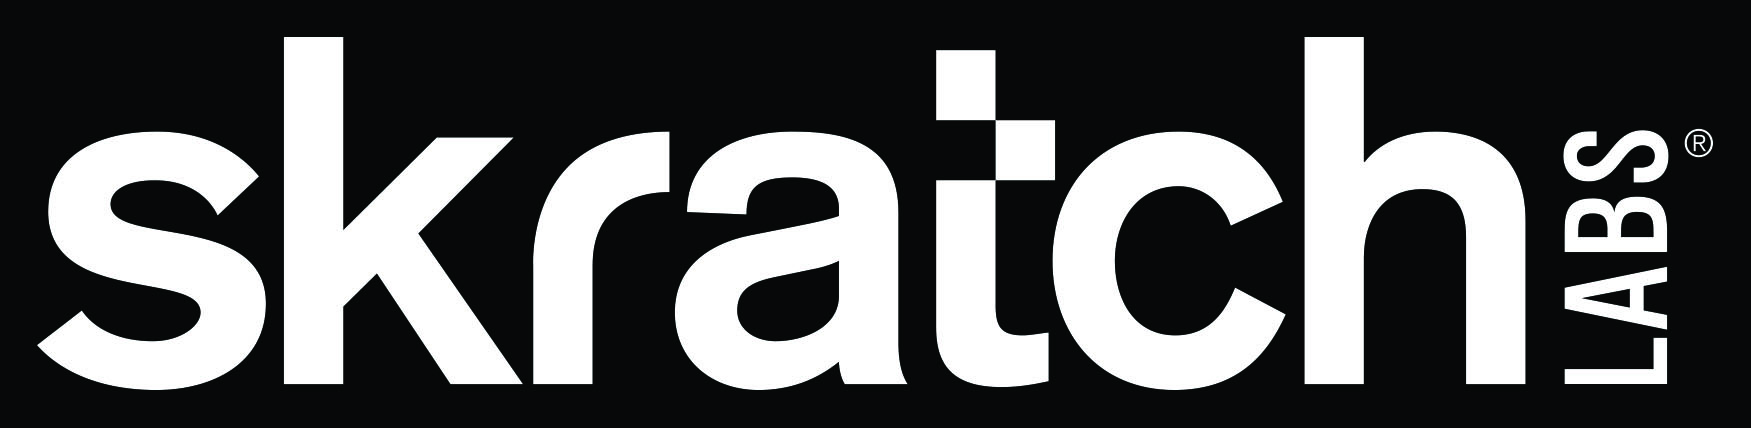 skratch_logo_white on black®.jpg